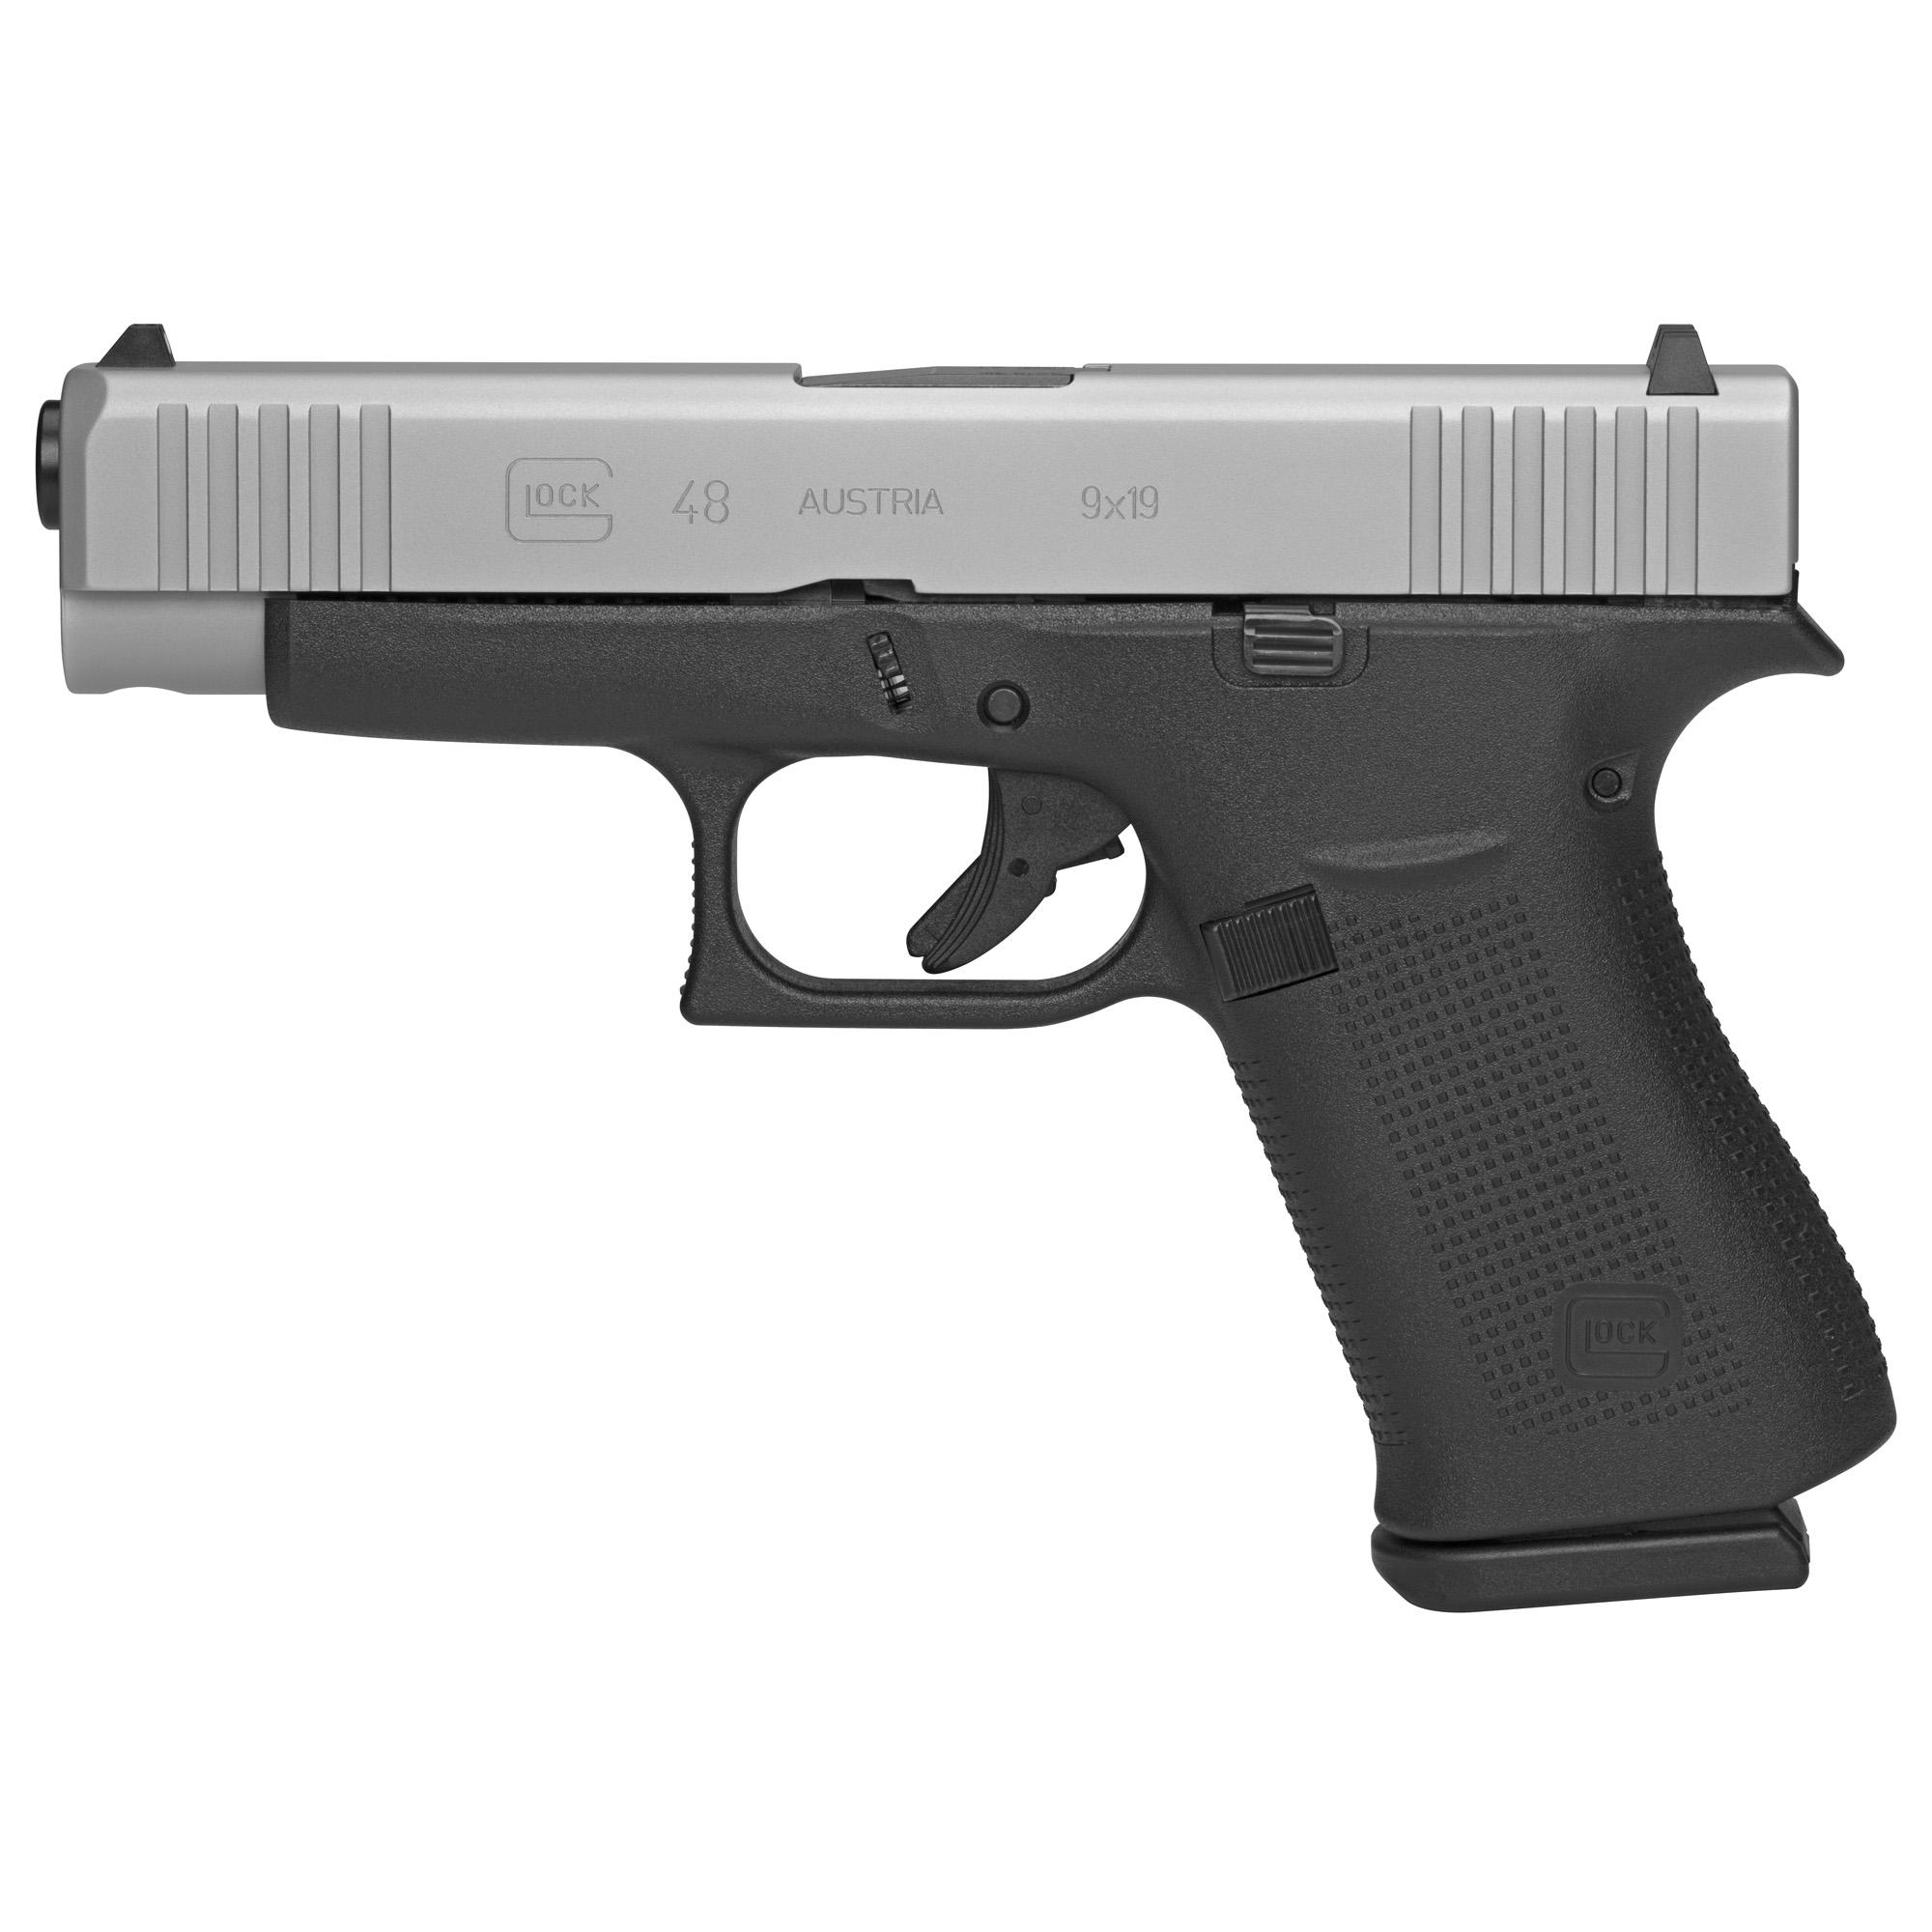 Wts/glock new offering 43x and 48 slimline-48.jpg